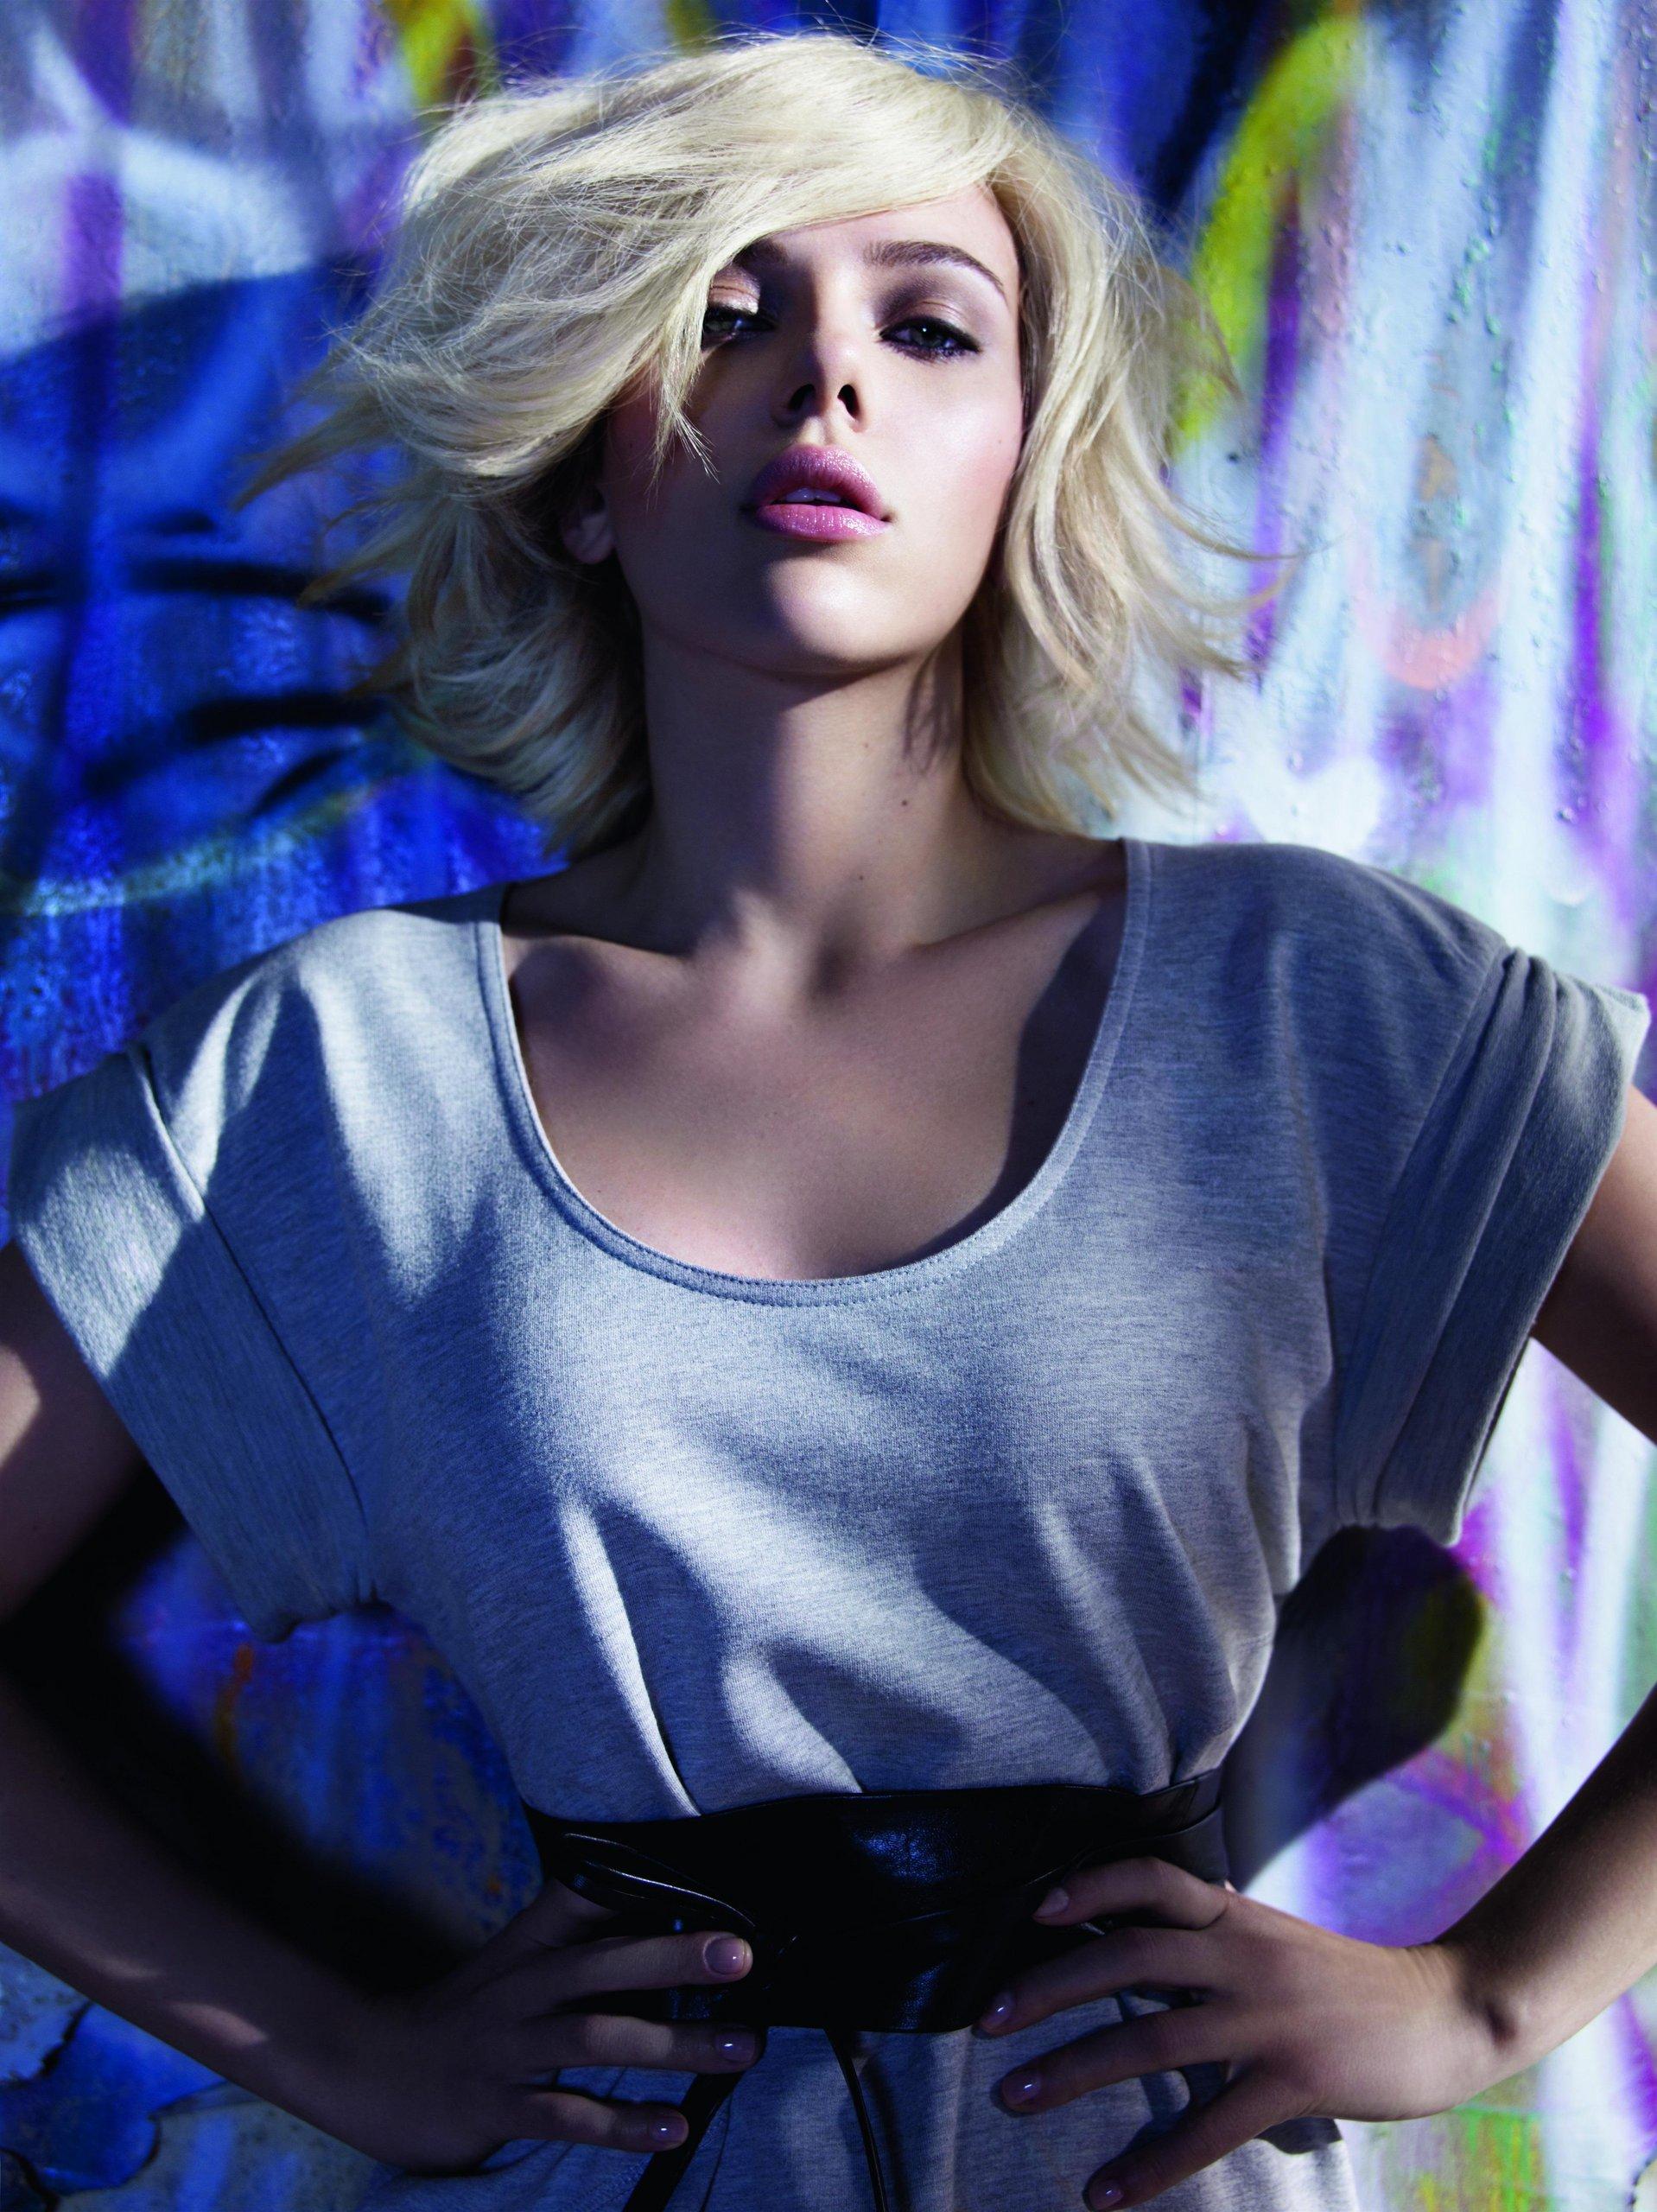 Scarlett Johansson | Mango Photoshoot (UHQ) - Scarlett ... скарлетт йоханссон